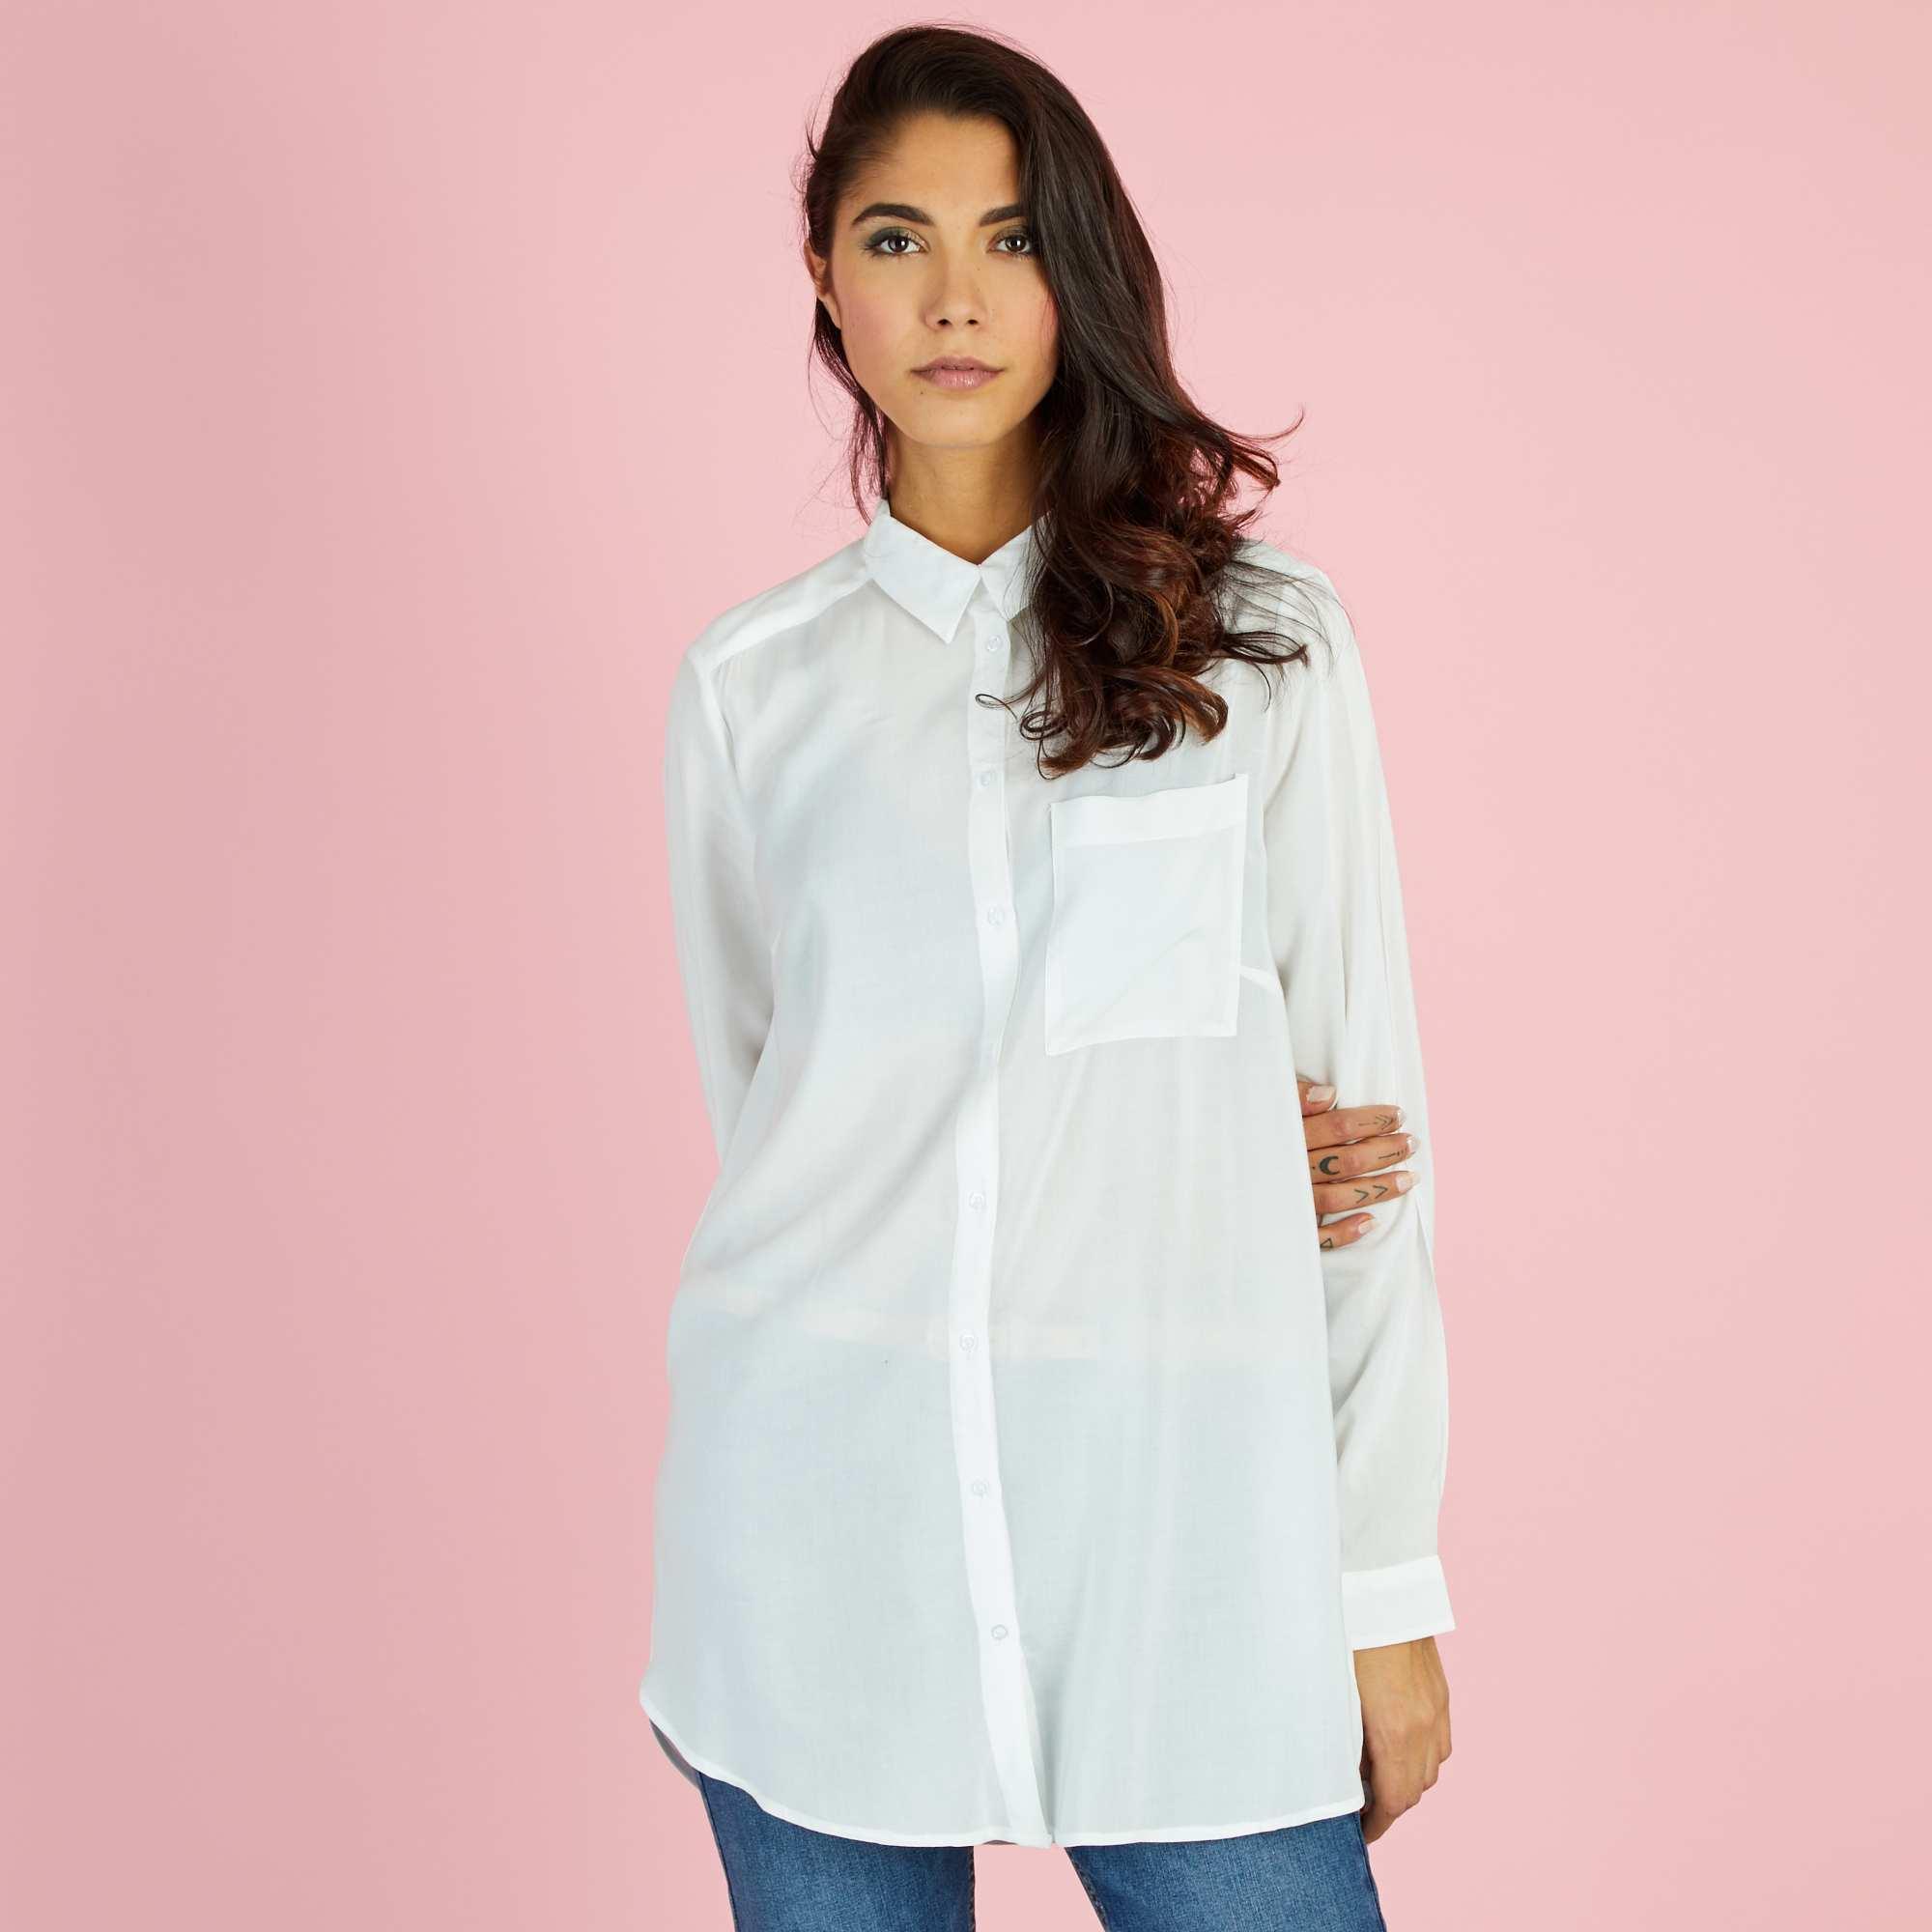 chemise longue en viscose femme blanc cass kiabi 15 00. Black Bedroom Furniture Sets. Home Design Ideas